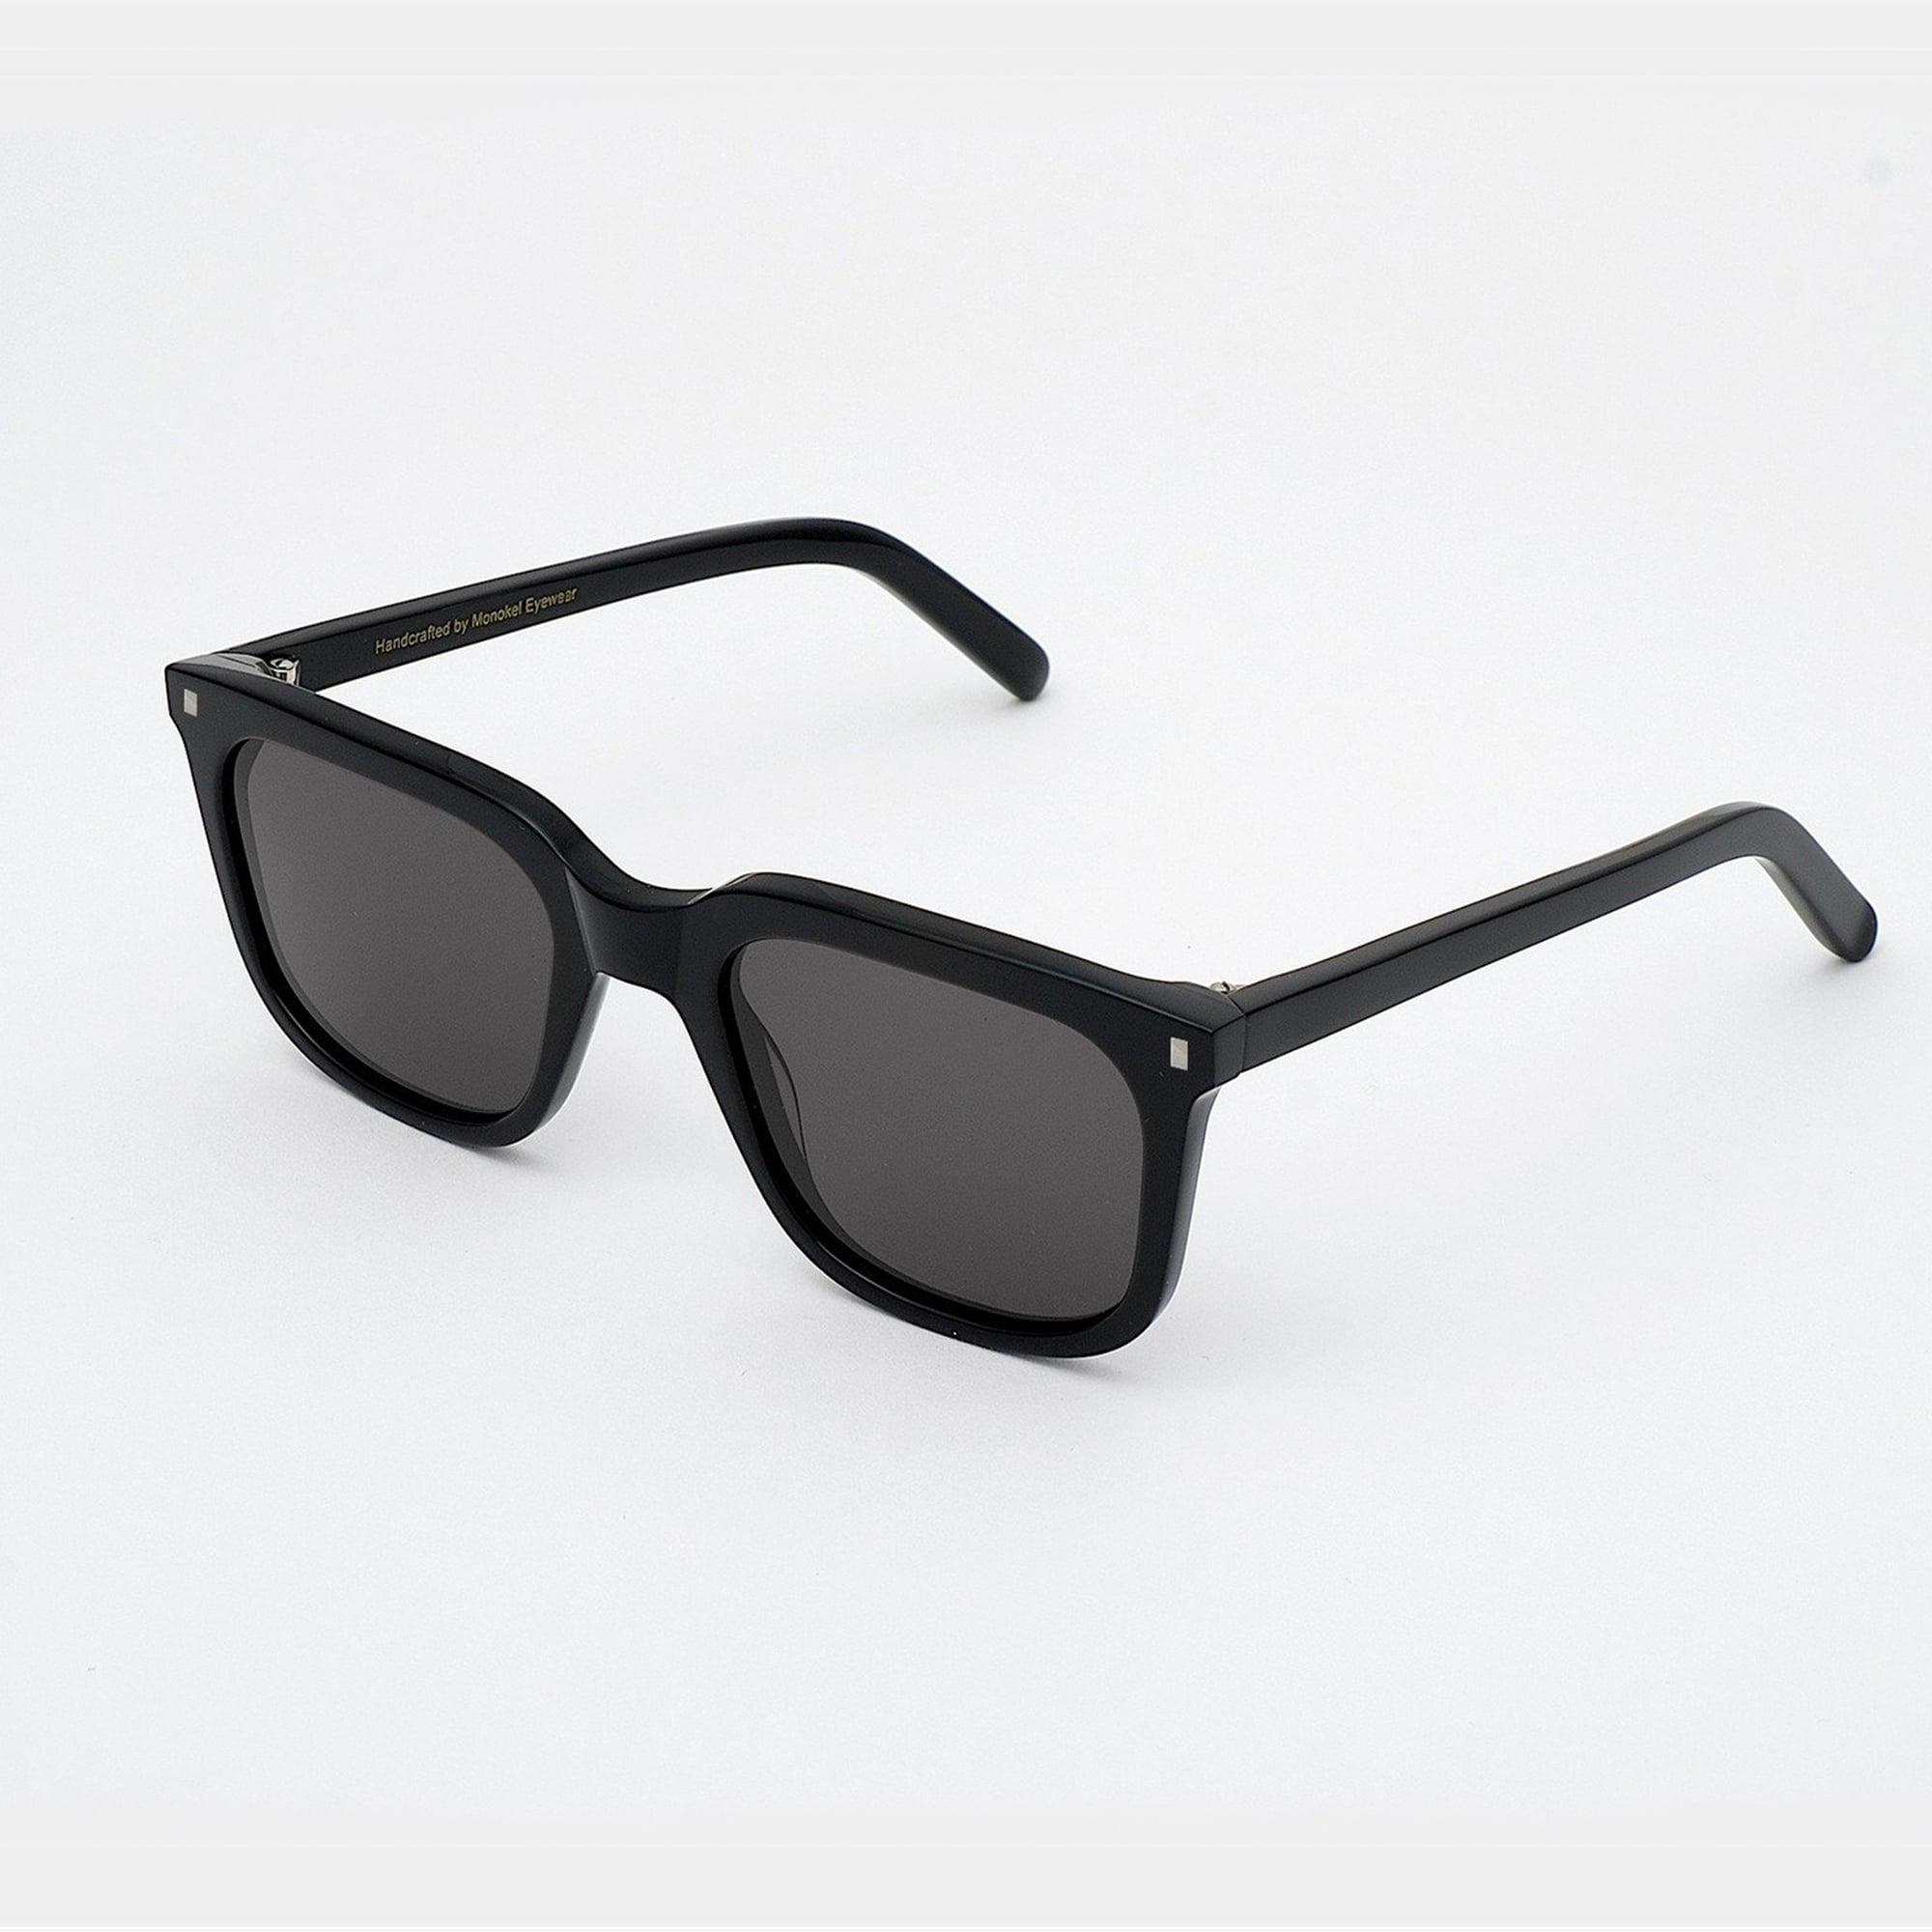 a845863e38463 Monokel Eyewear Robotnik Sunglasses (Black) at Dandy Fellow